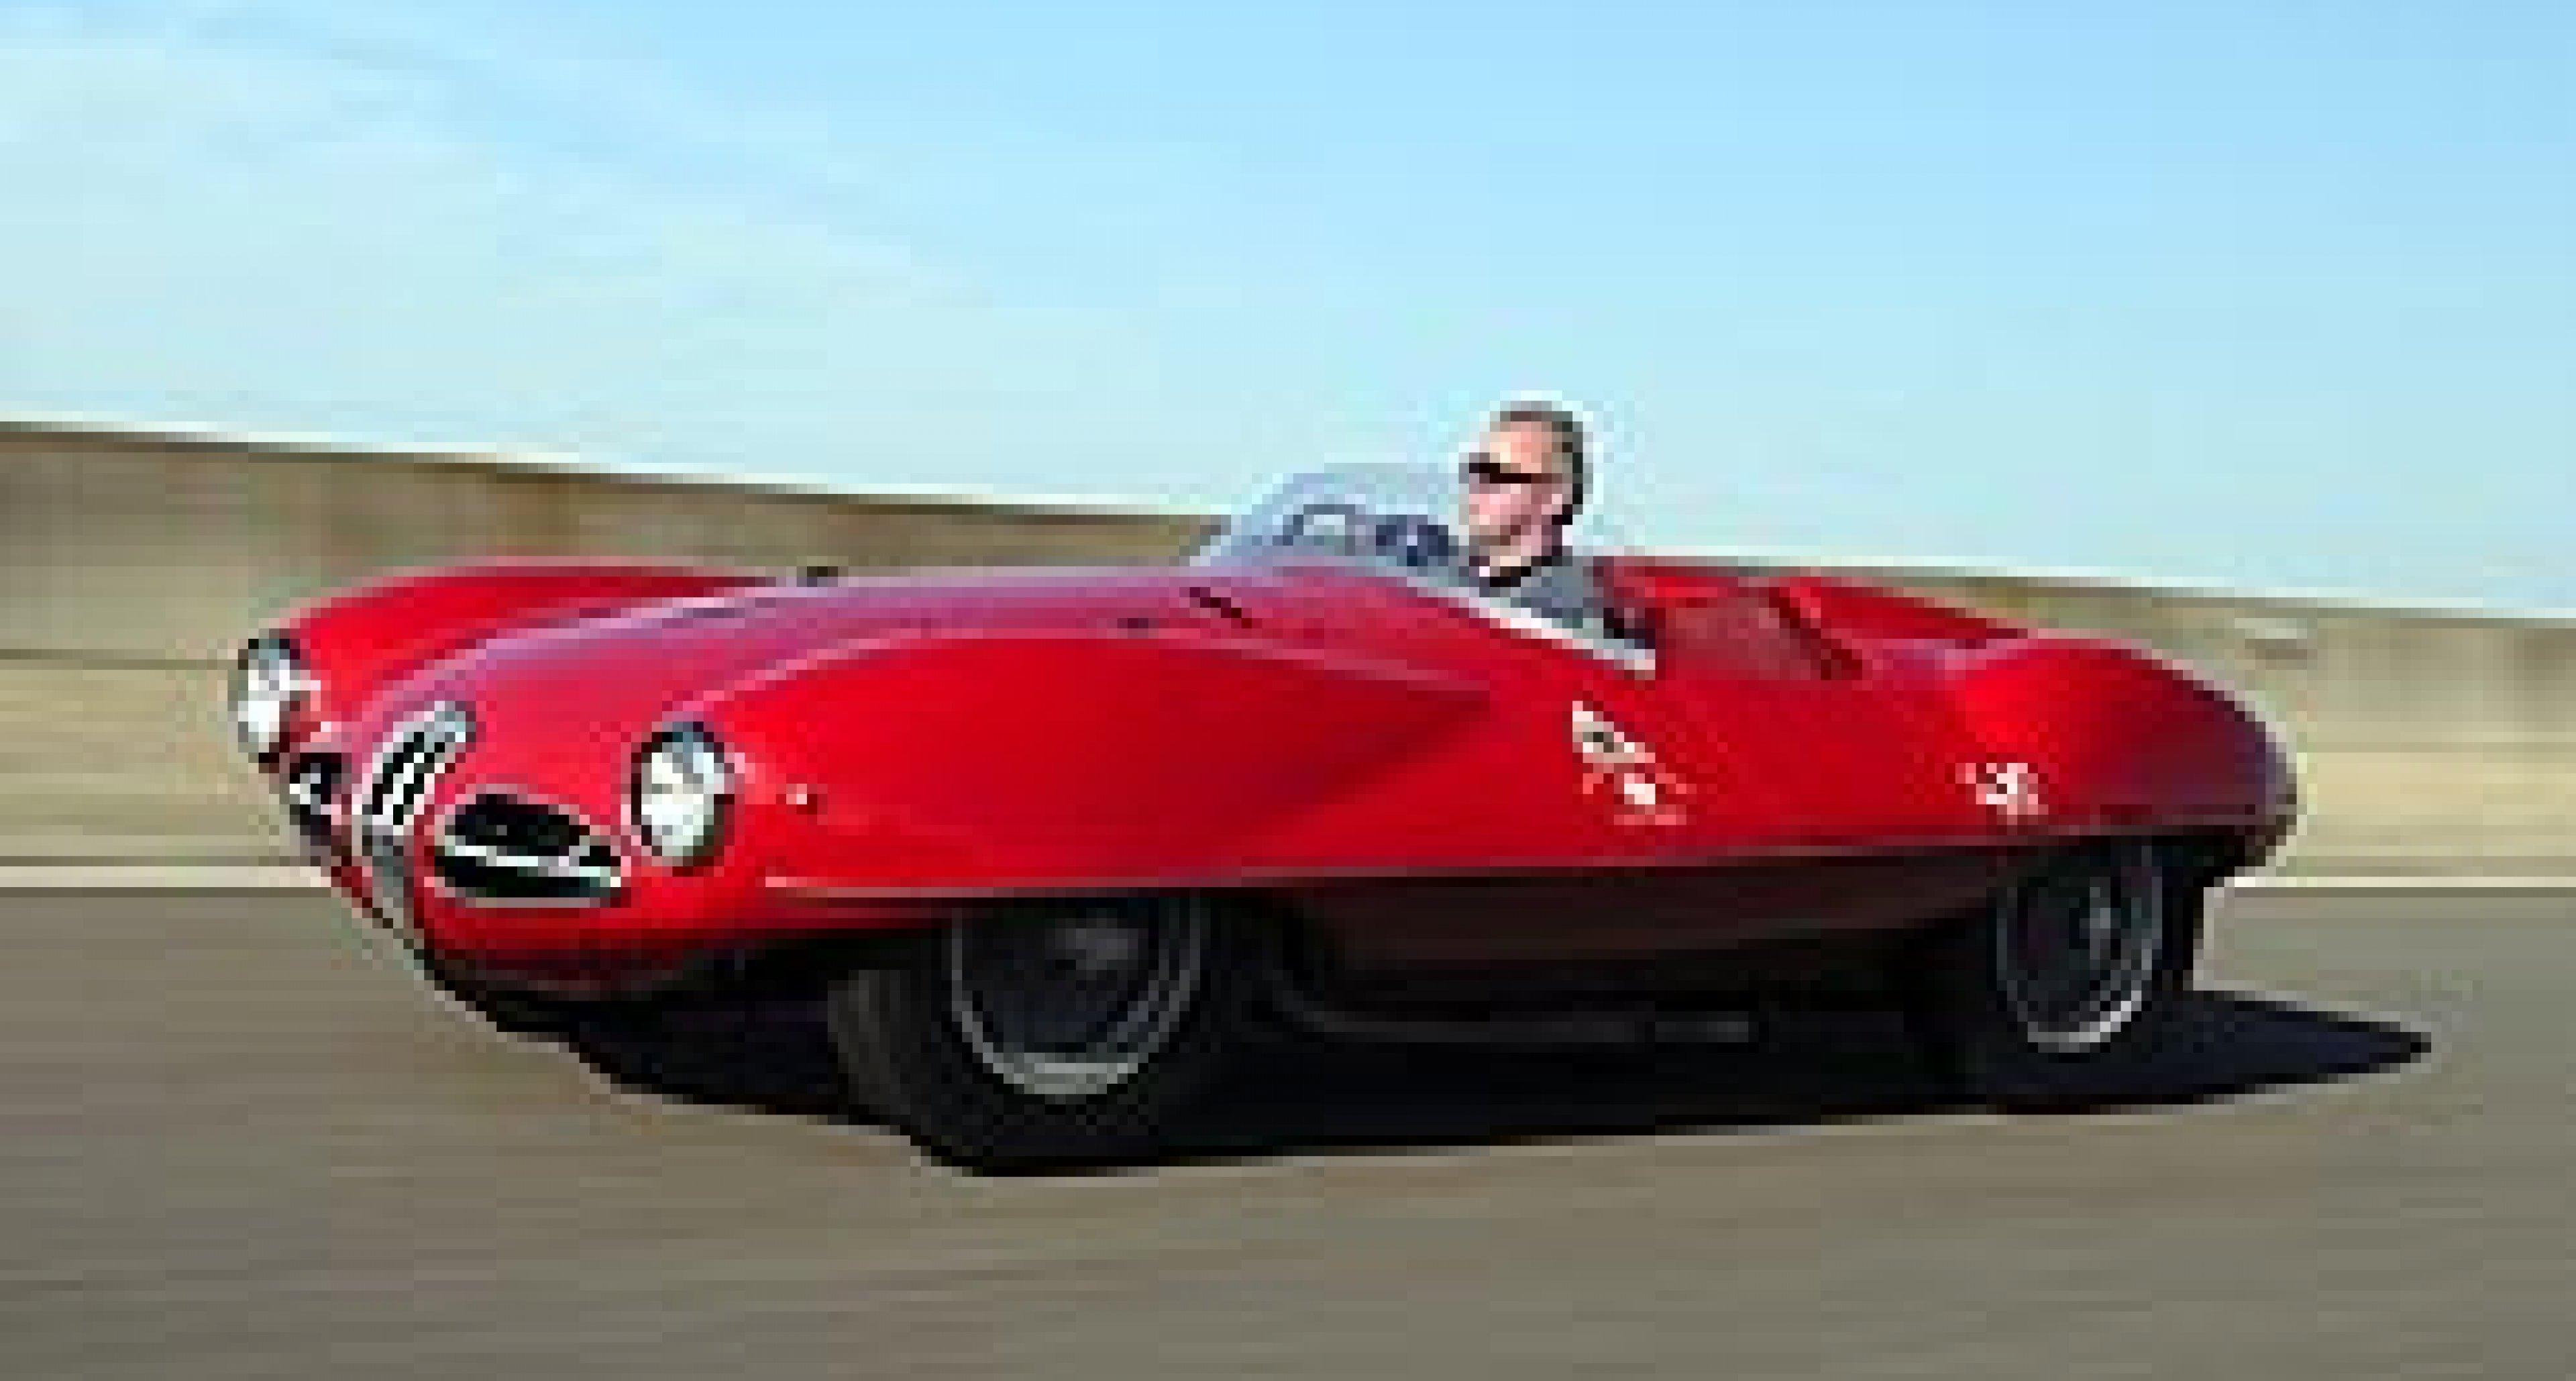 Alfa Romeos: Sampling the Greatest – Part 1